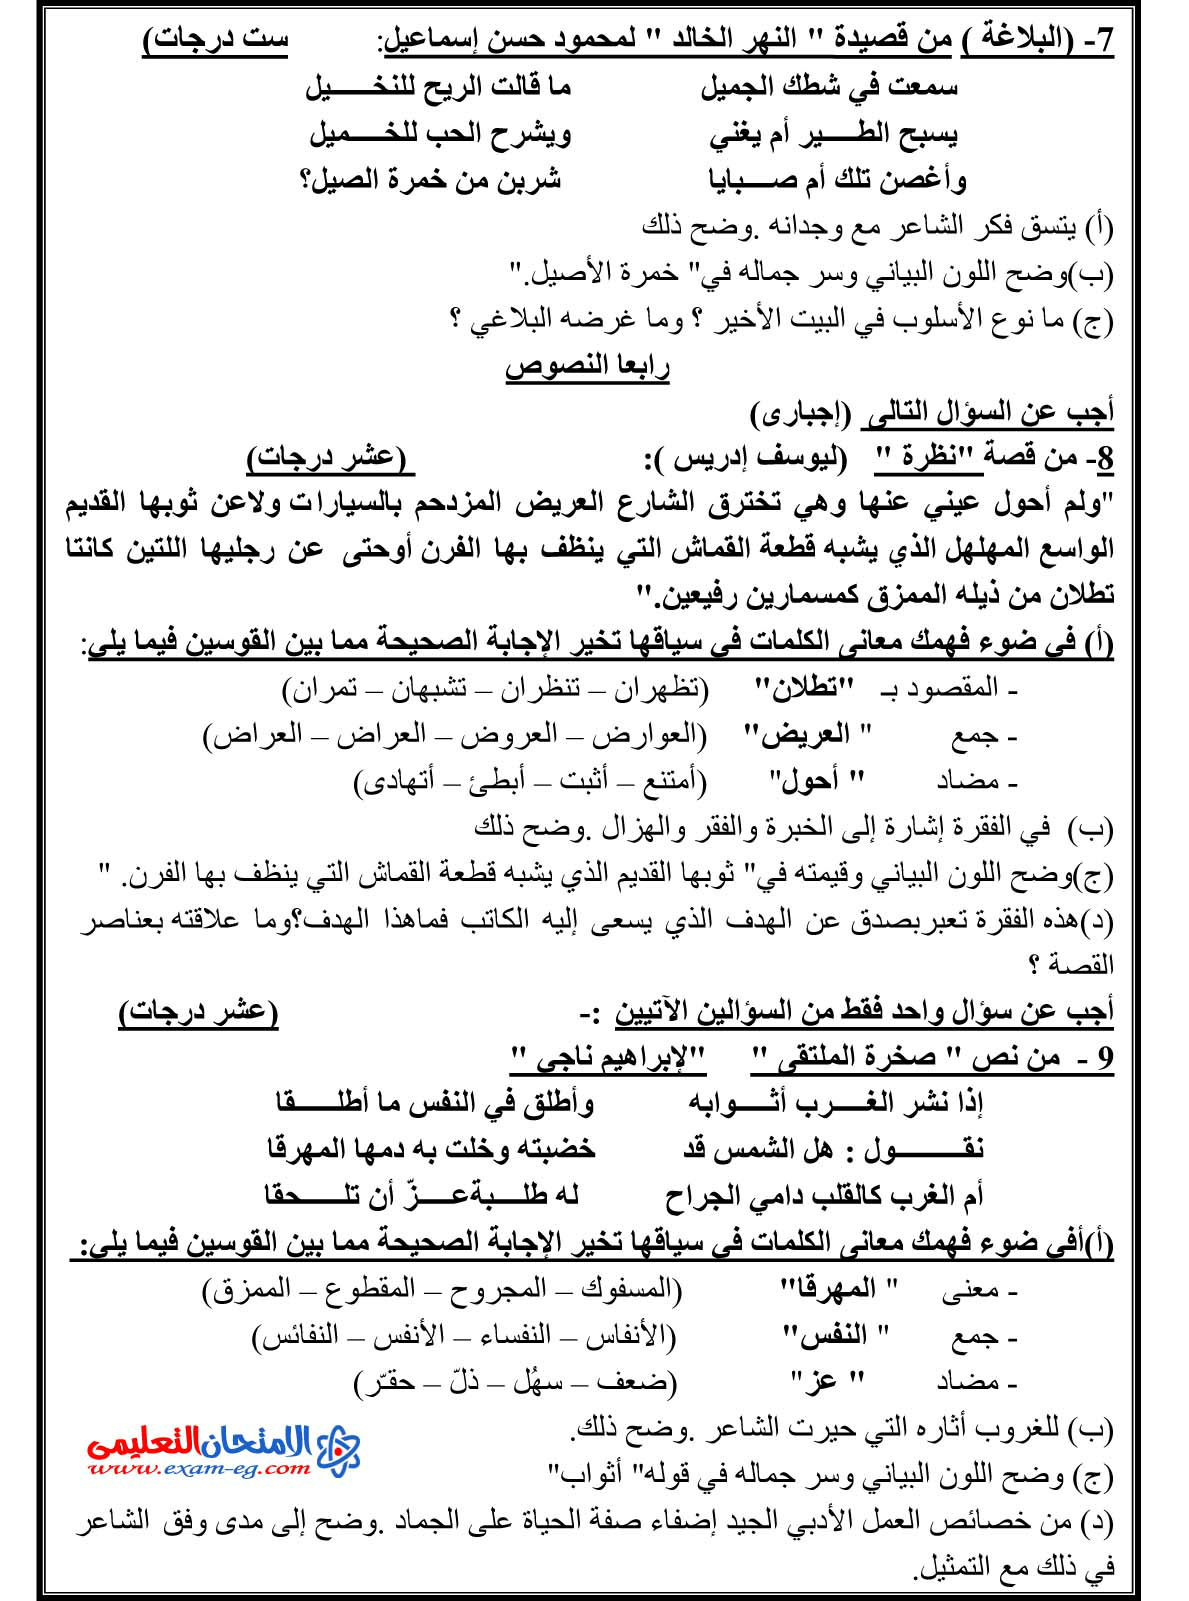 exam-eg.com_1429231820843.jpg